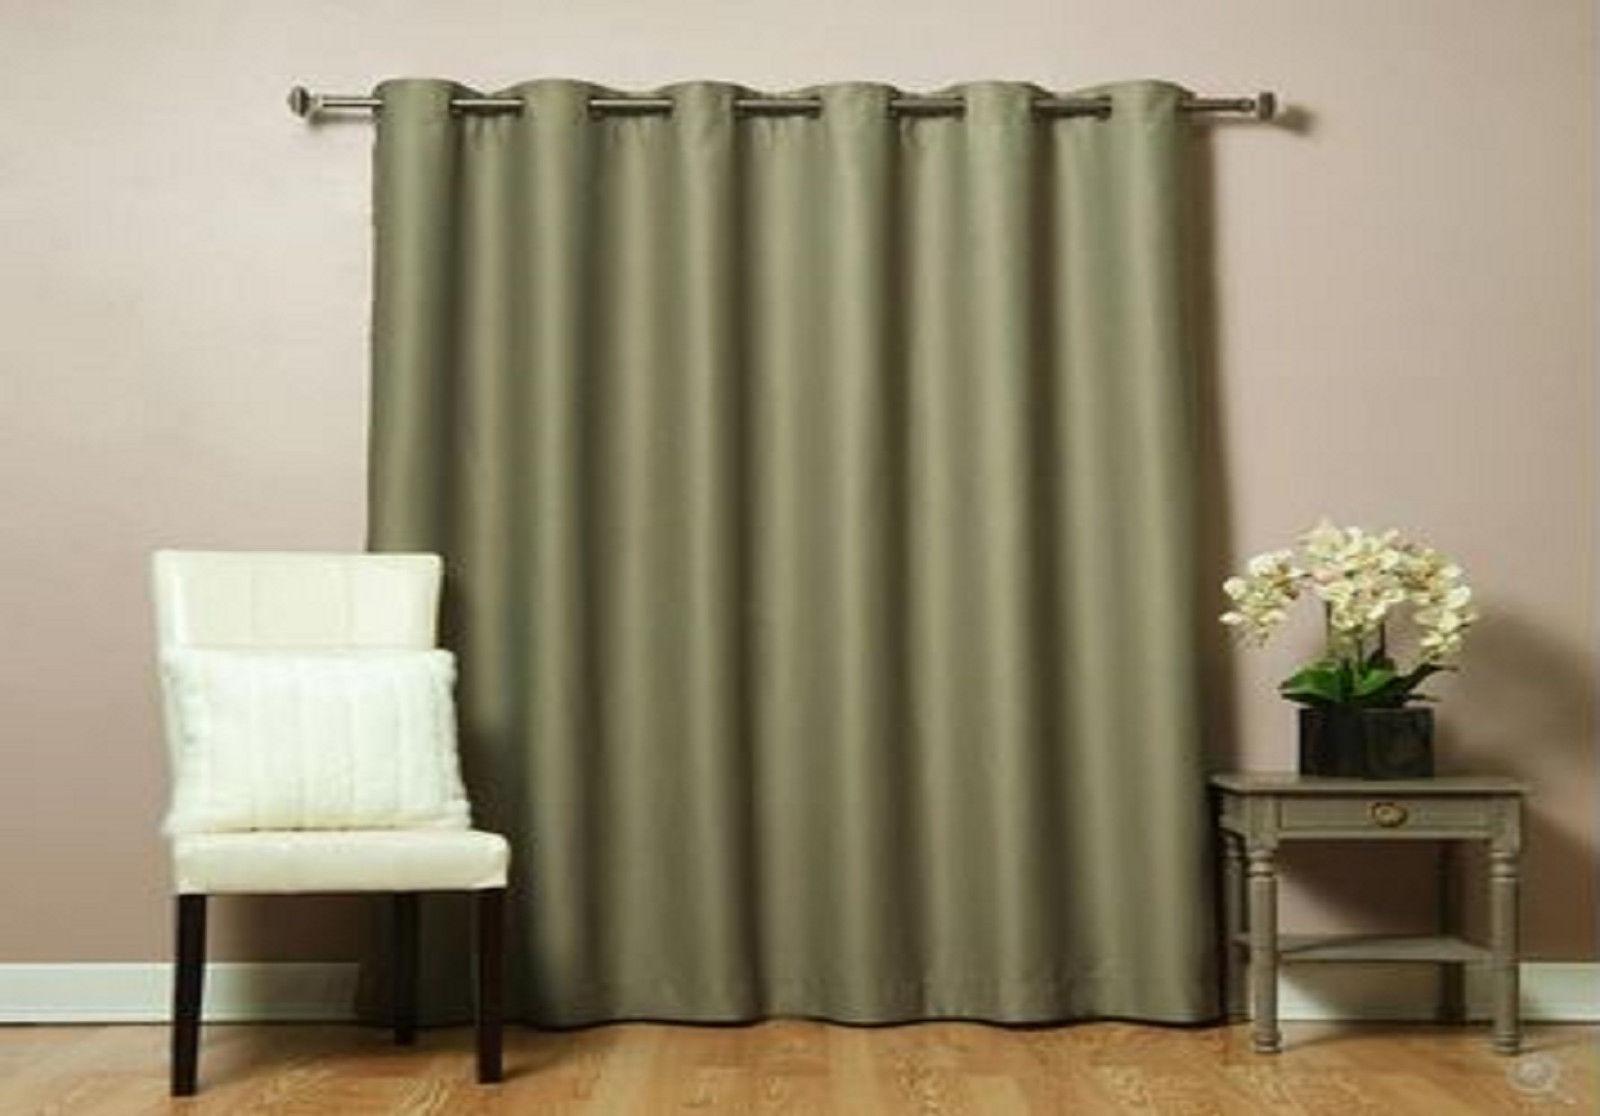 Wide Width Patio Bedroom Livingroom Grommet Window Treatment Curtains Drapes Curtains Drapes